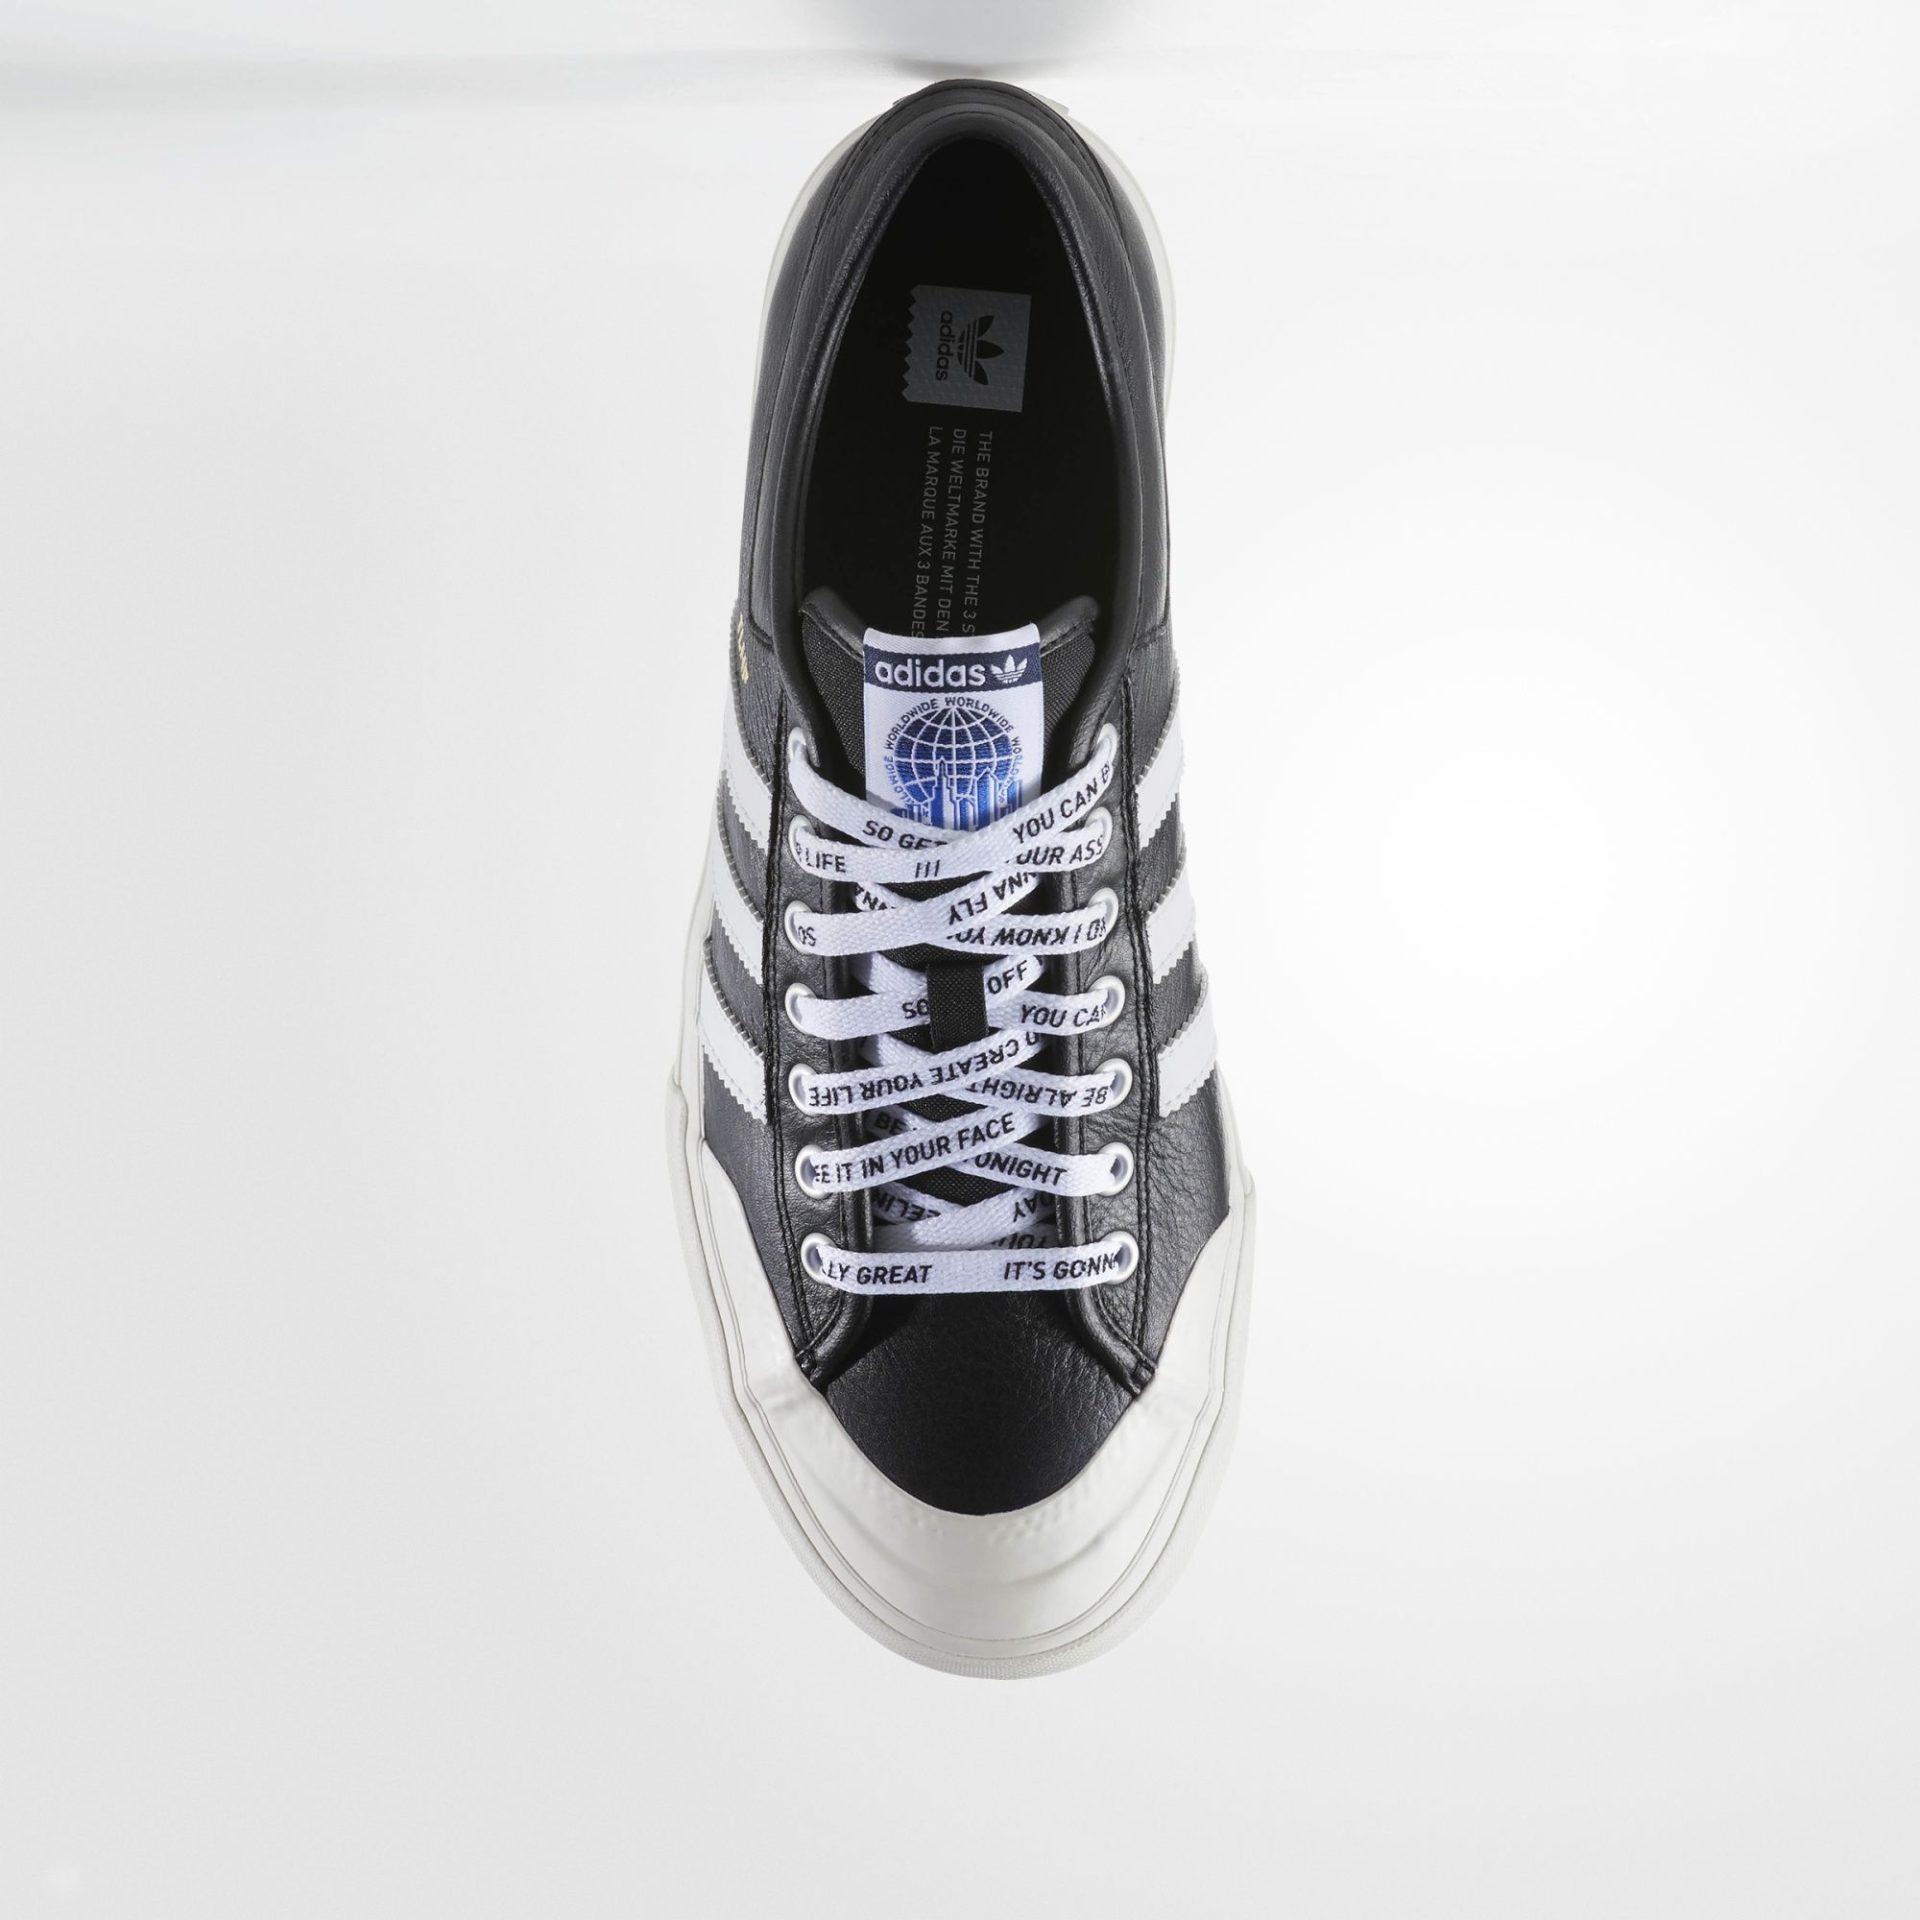 Trap Lord x adidas Skateboarding Collection FallWinter